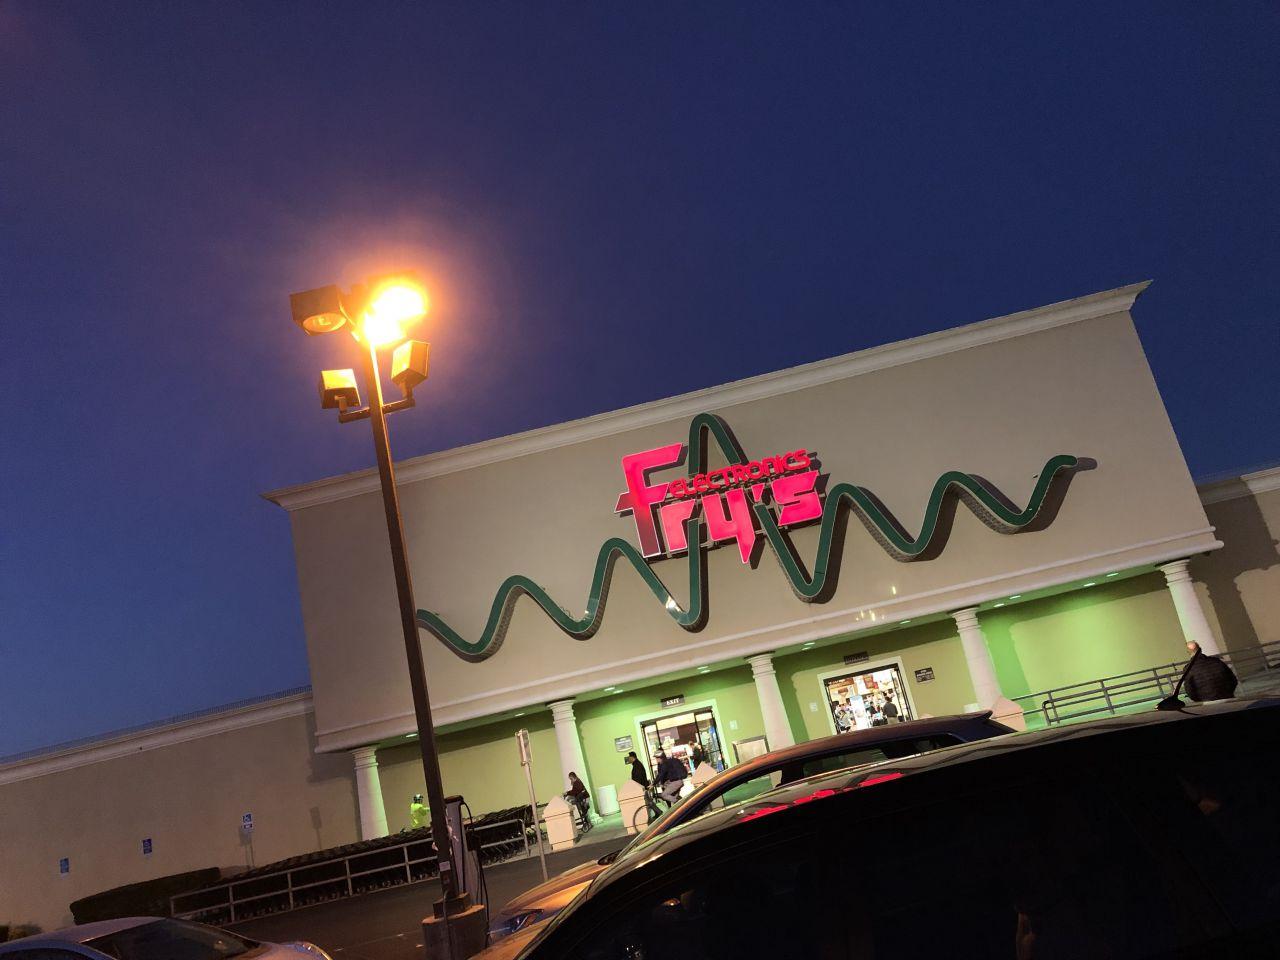 Fry's Electronics Sunnyvale Nighttime